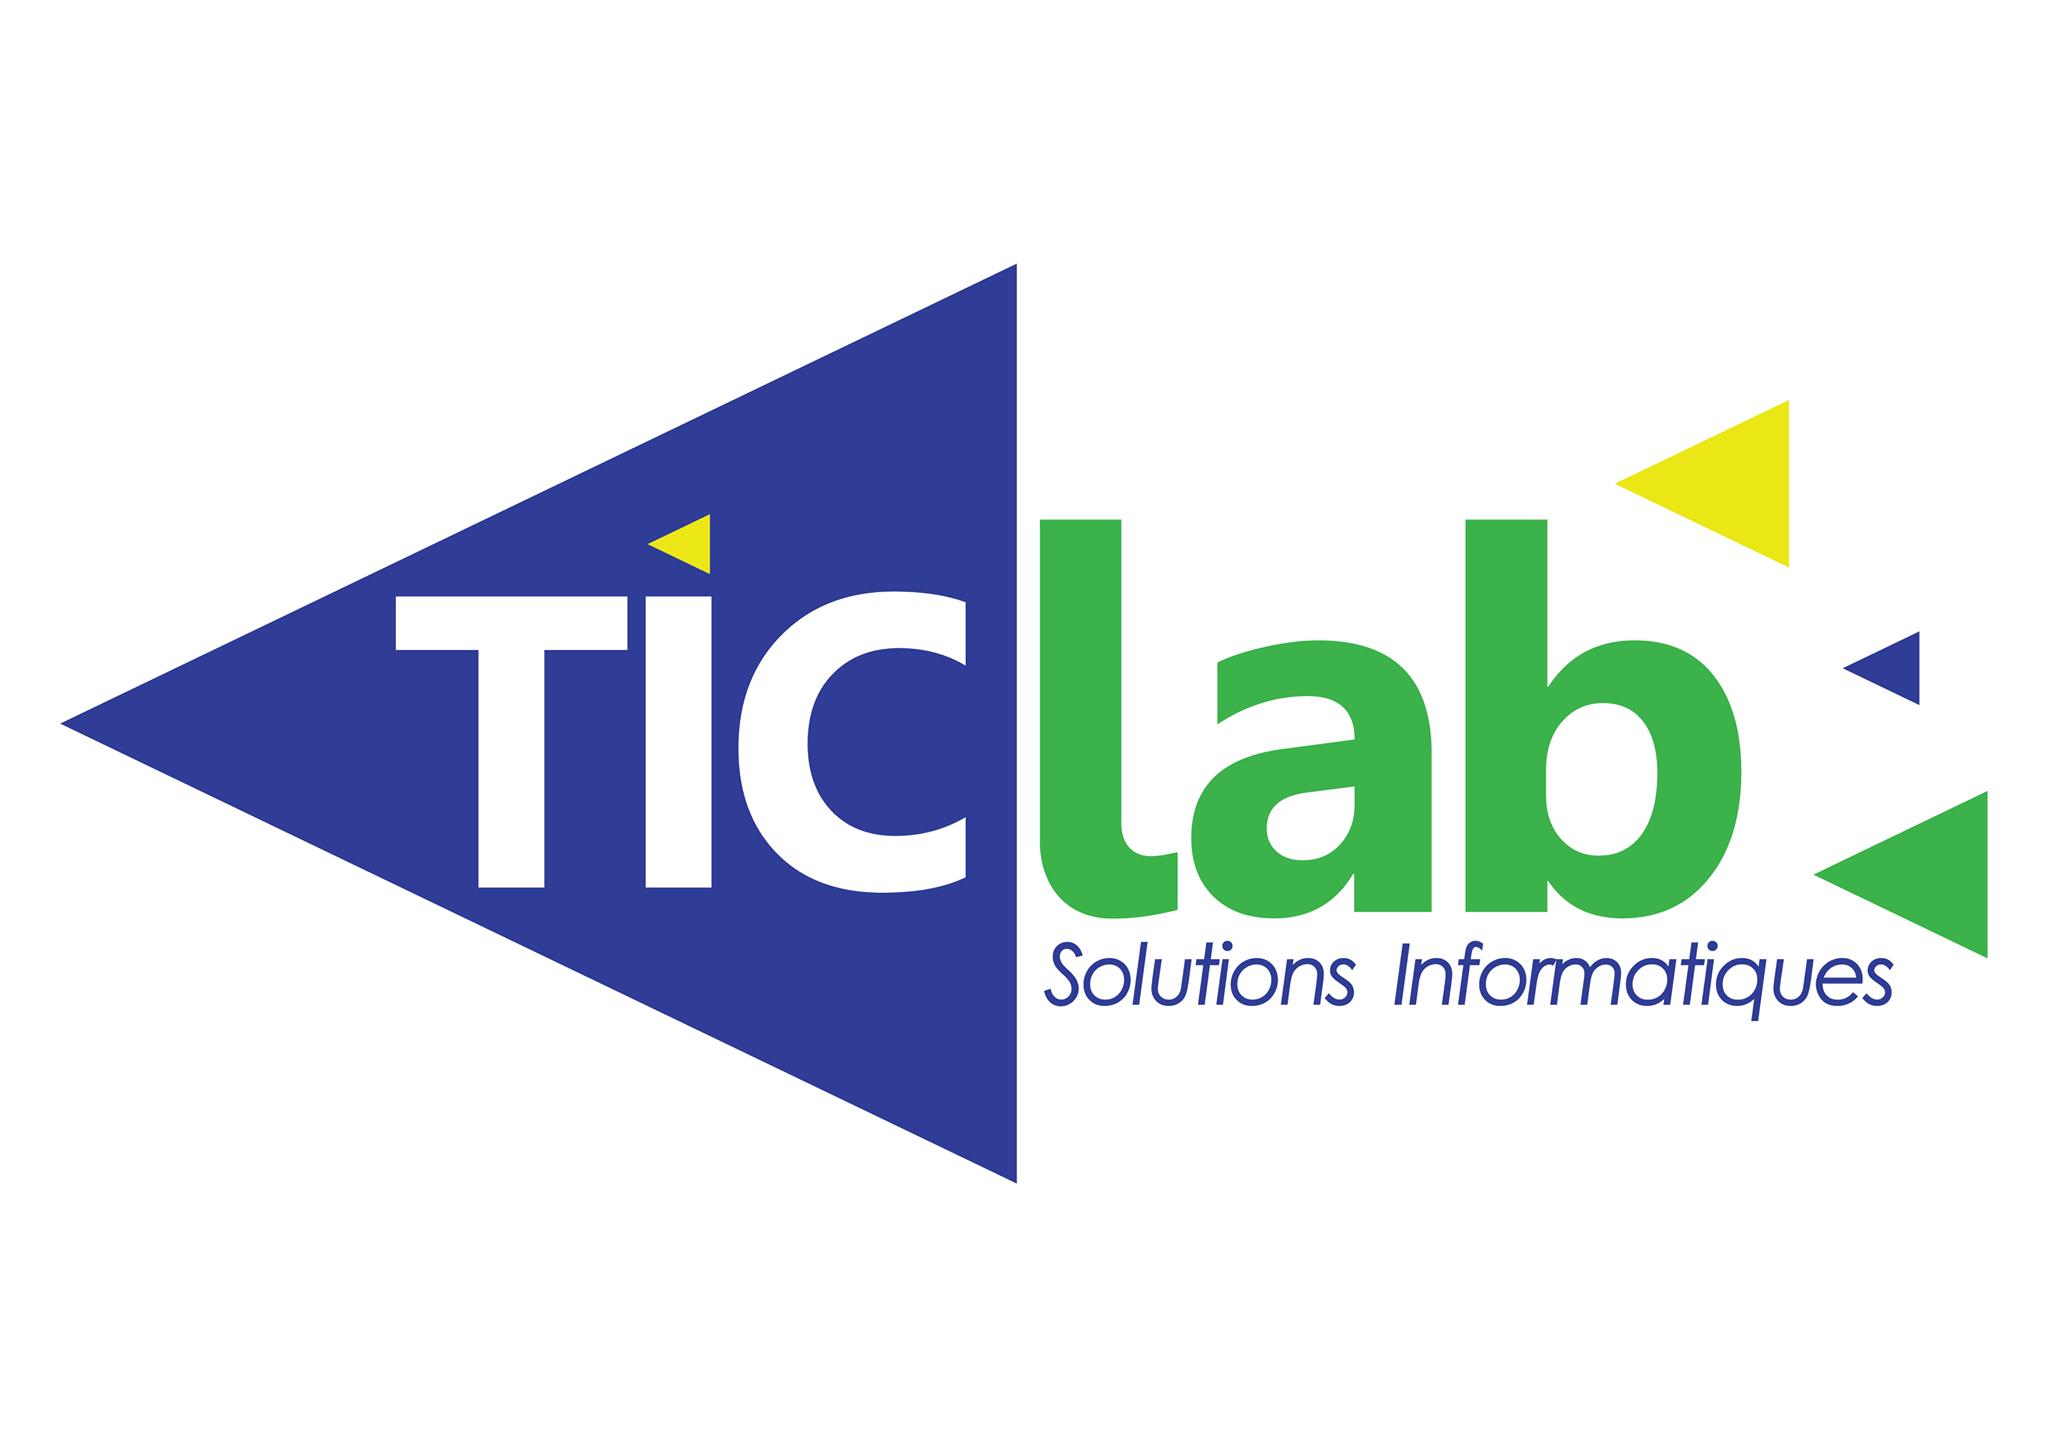 Ticlab